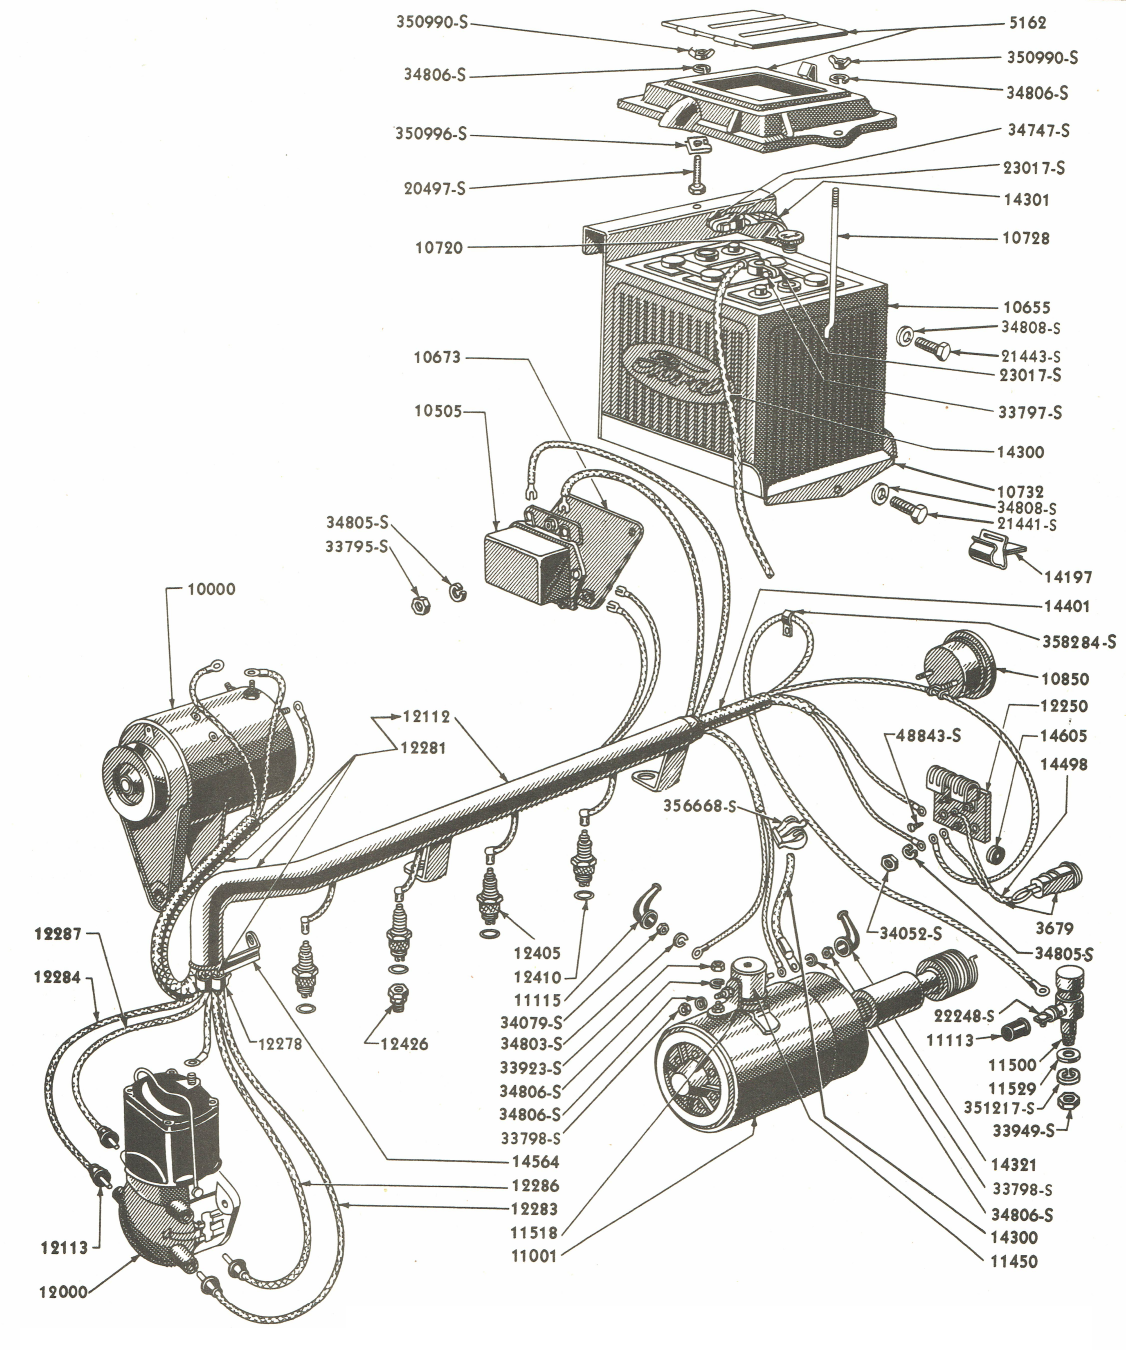 Diagram] 1947 8N Wiring Diagram Full Version Hd Quality